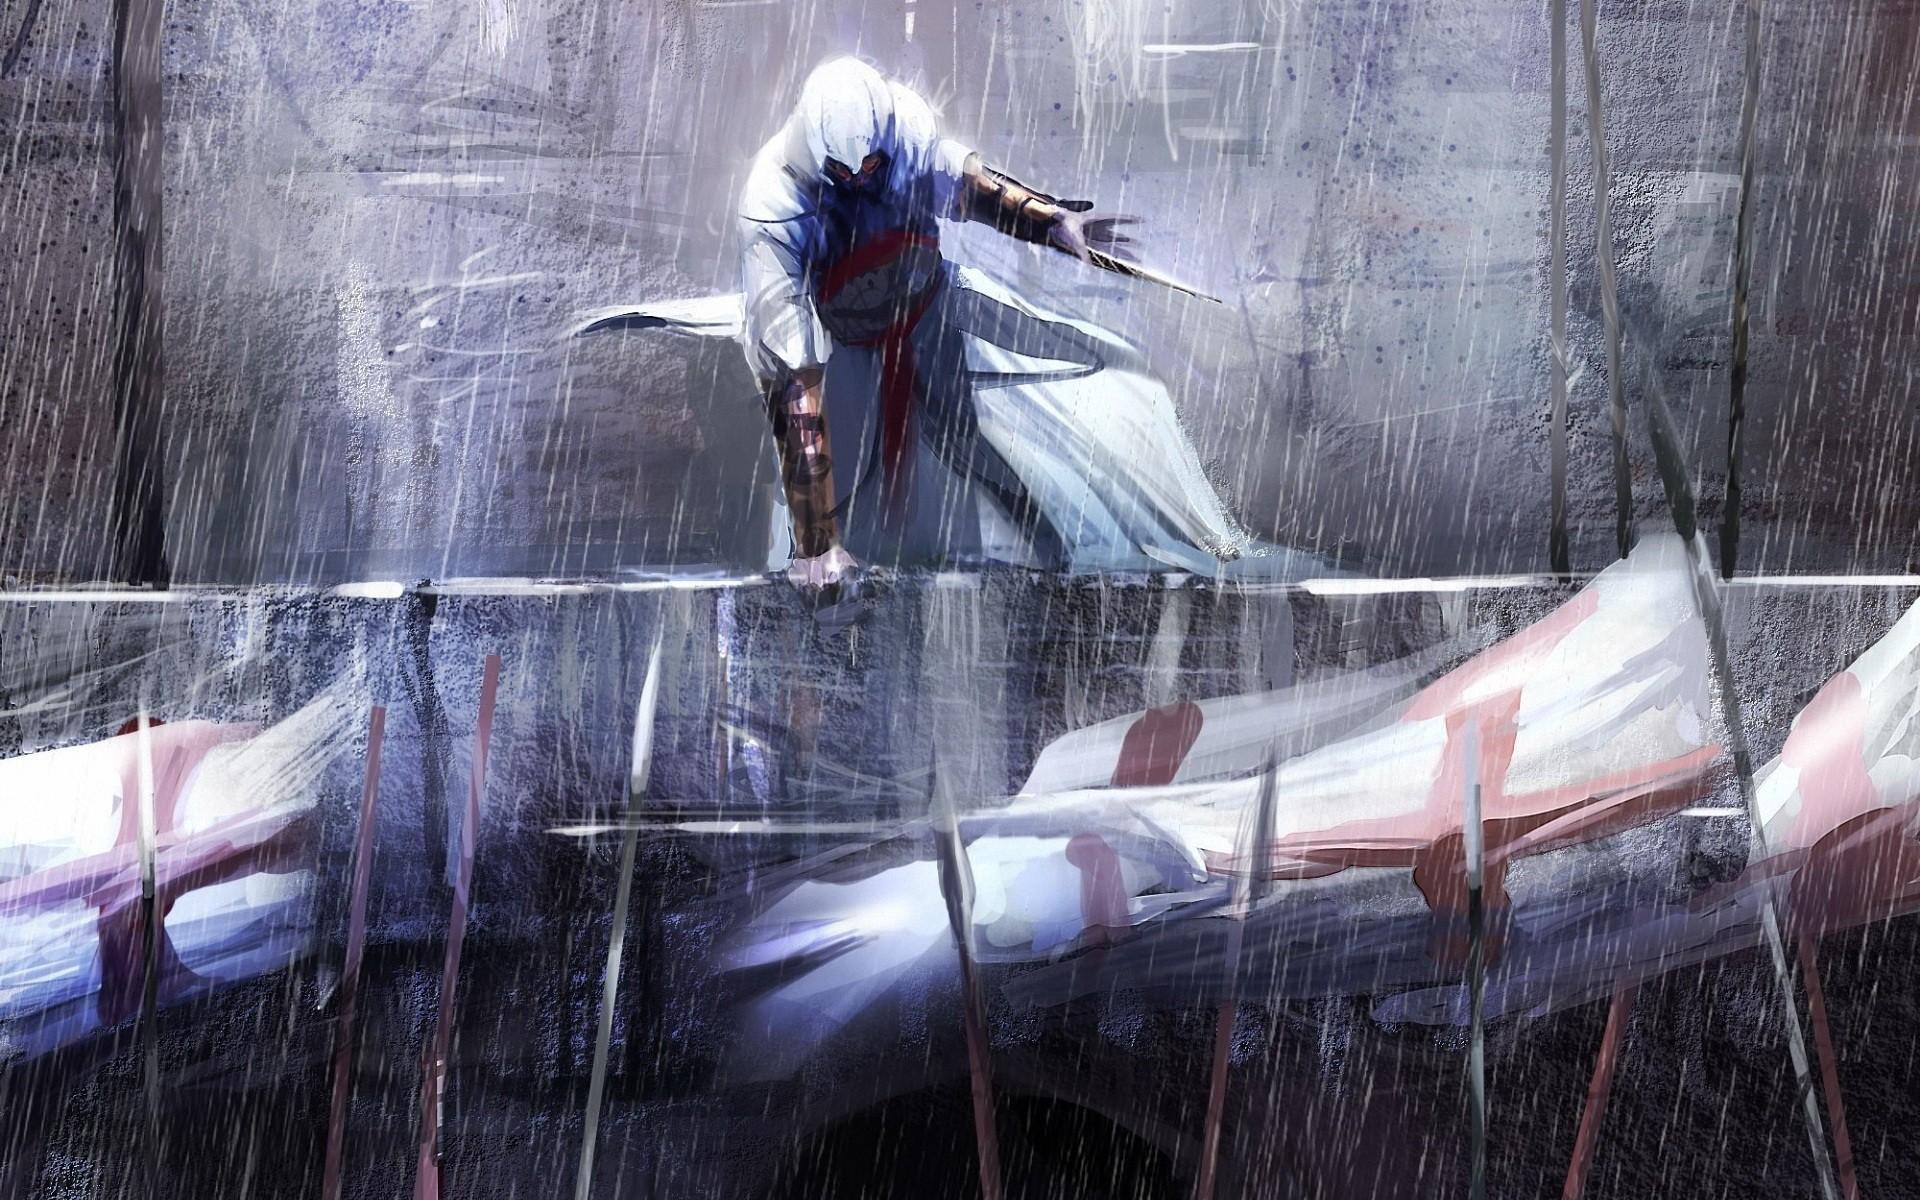 Video Games Assassins Creed Altair Assassins Rain Flags Fantasy